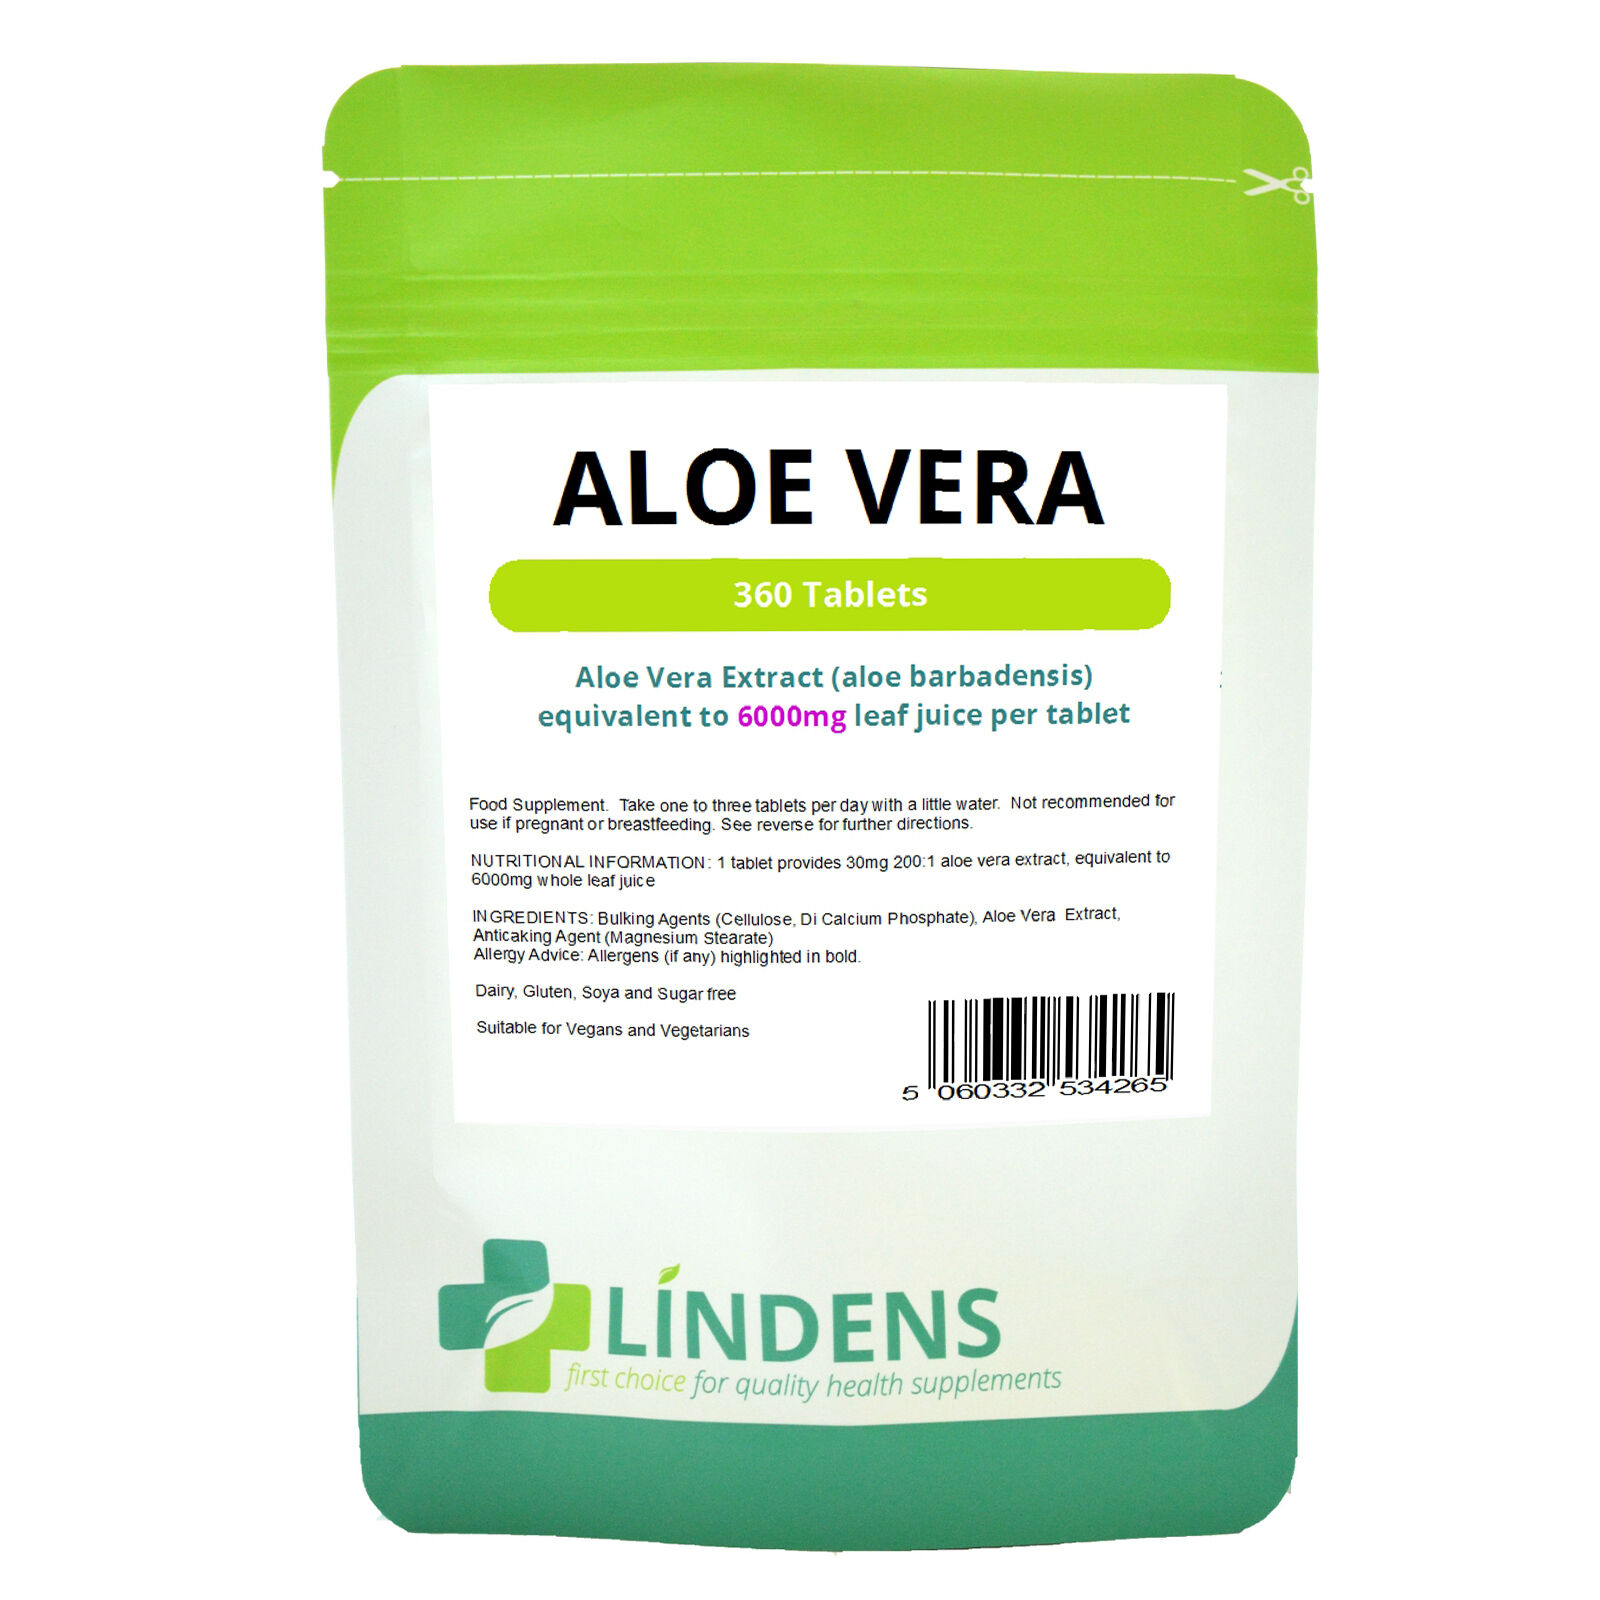 Details about Aloe Vera Gel 6000mg 360 Tablets ✰ Colon Cleanse Detox IBS  Juice Supplement ✰